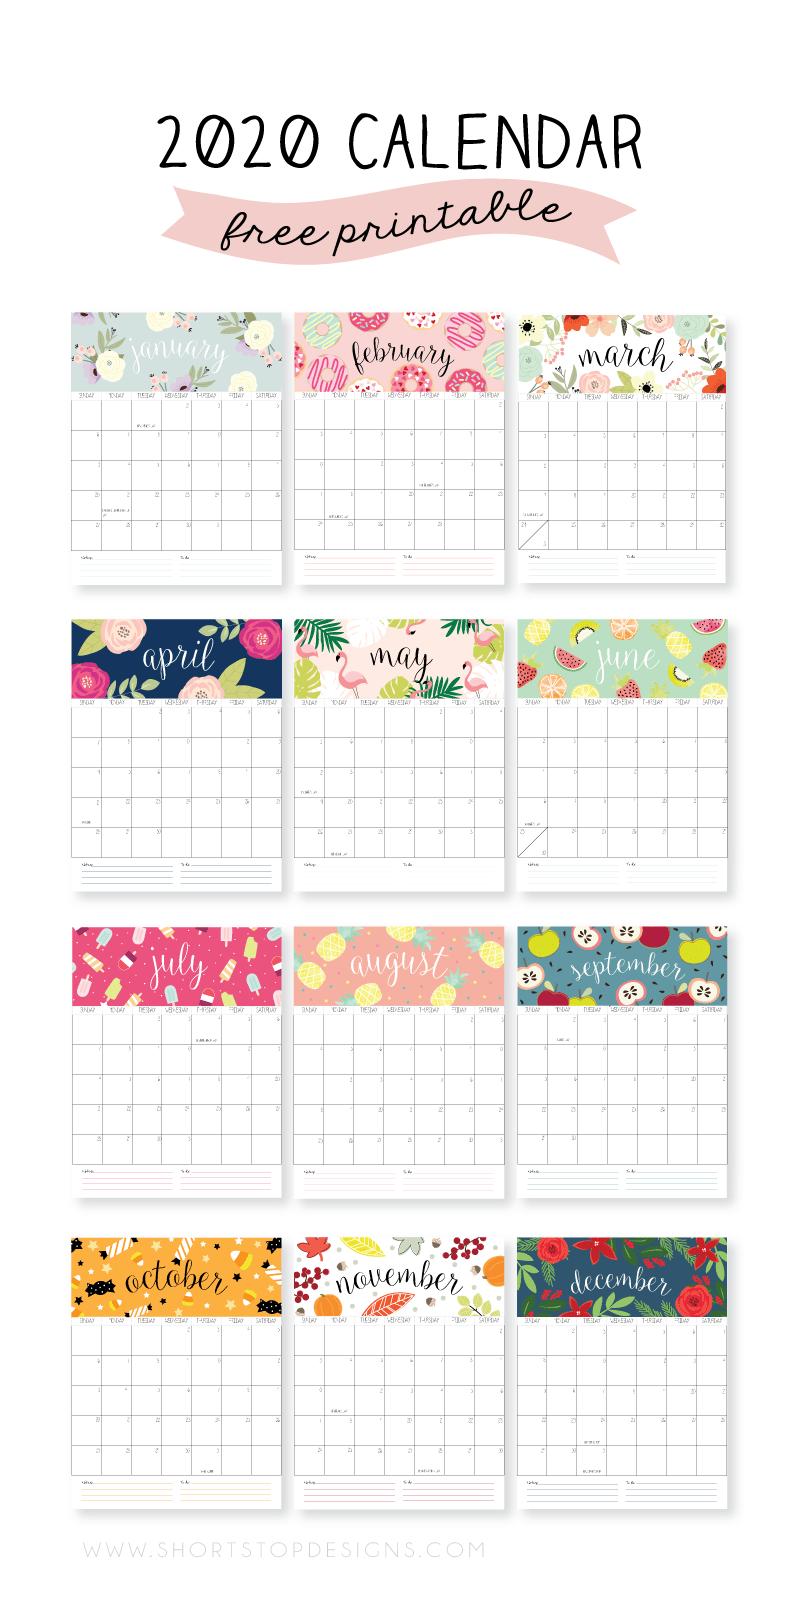 FREE Colorful Floral Style Printable 2020 Calendar PLUS a roundup of 50+ more styles! #2020calendar #freeprintable #printablecalendar